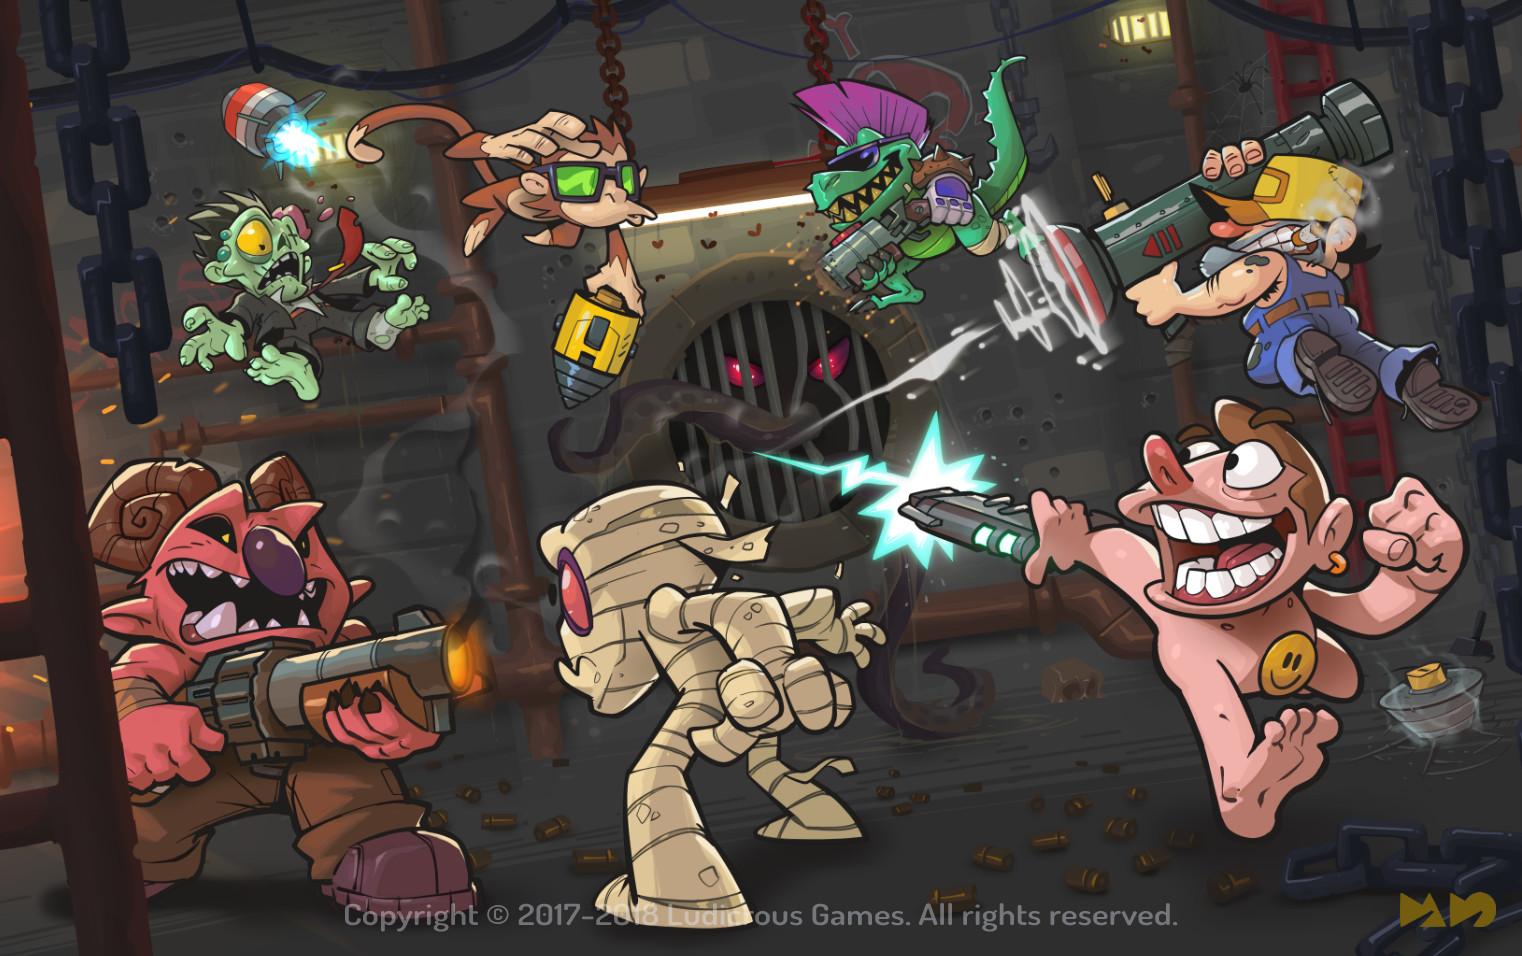 Ludicrous Games (Splash Images)